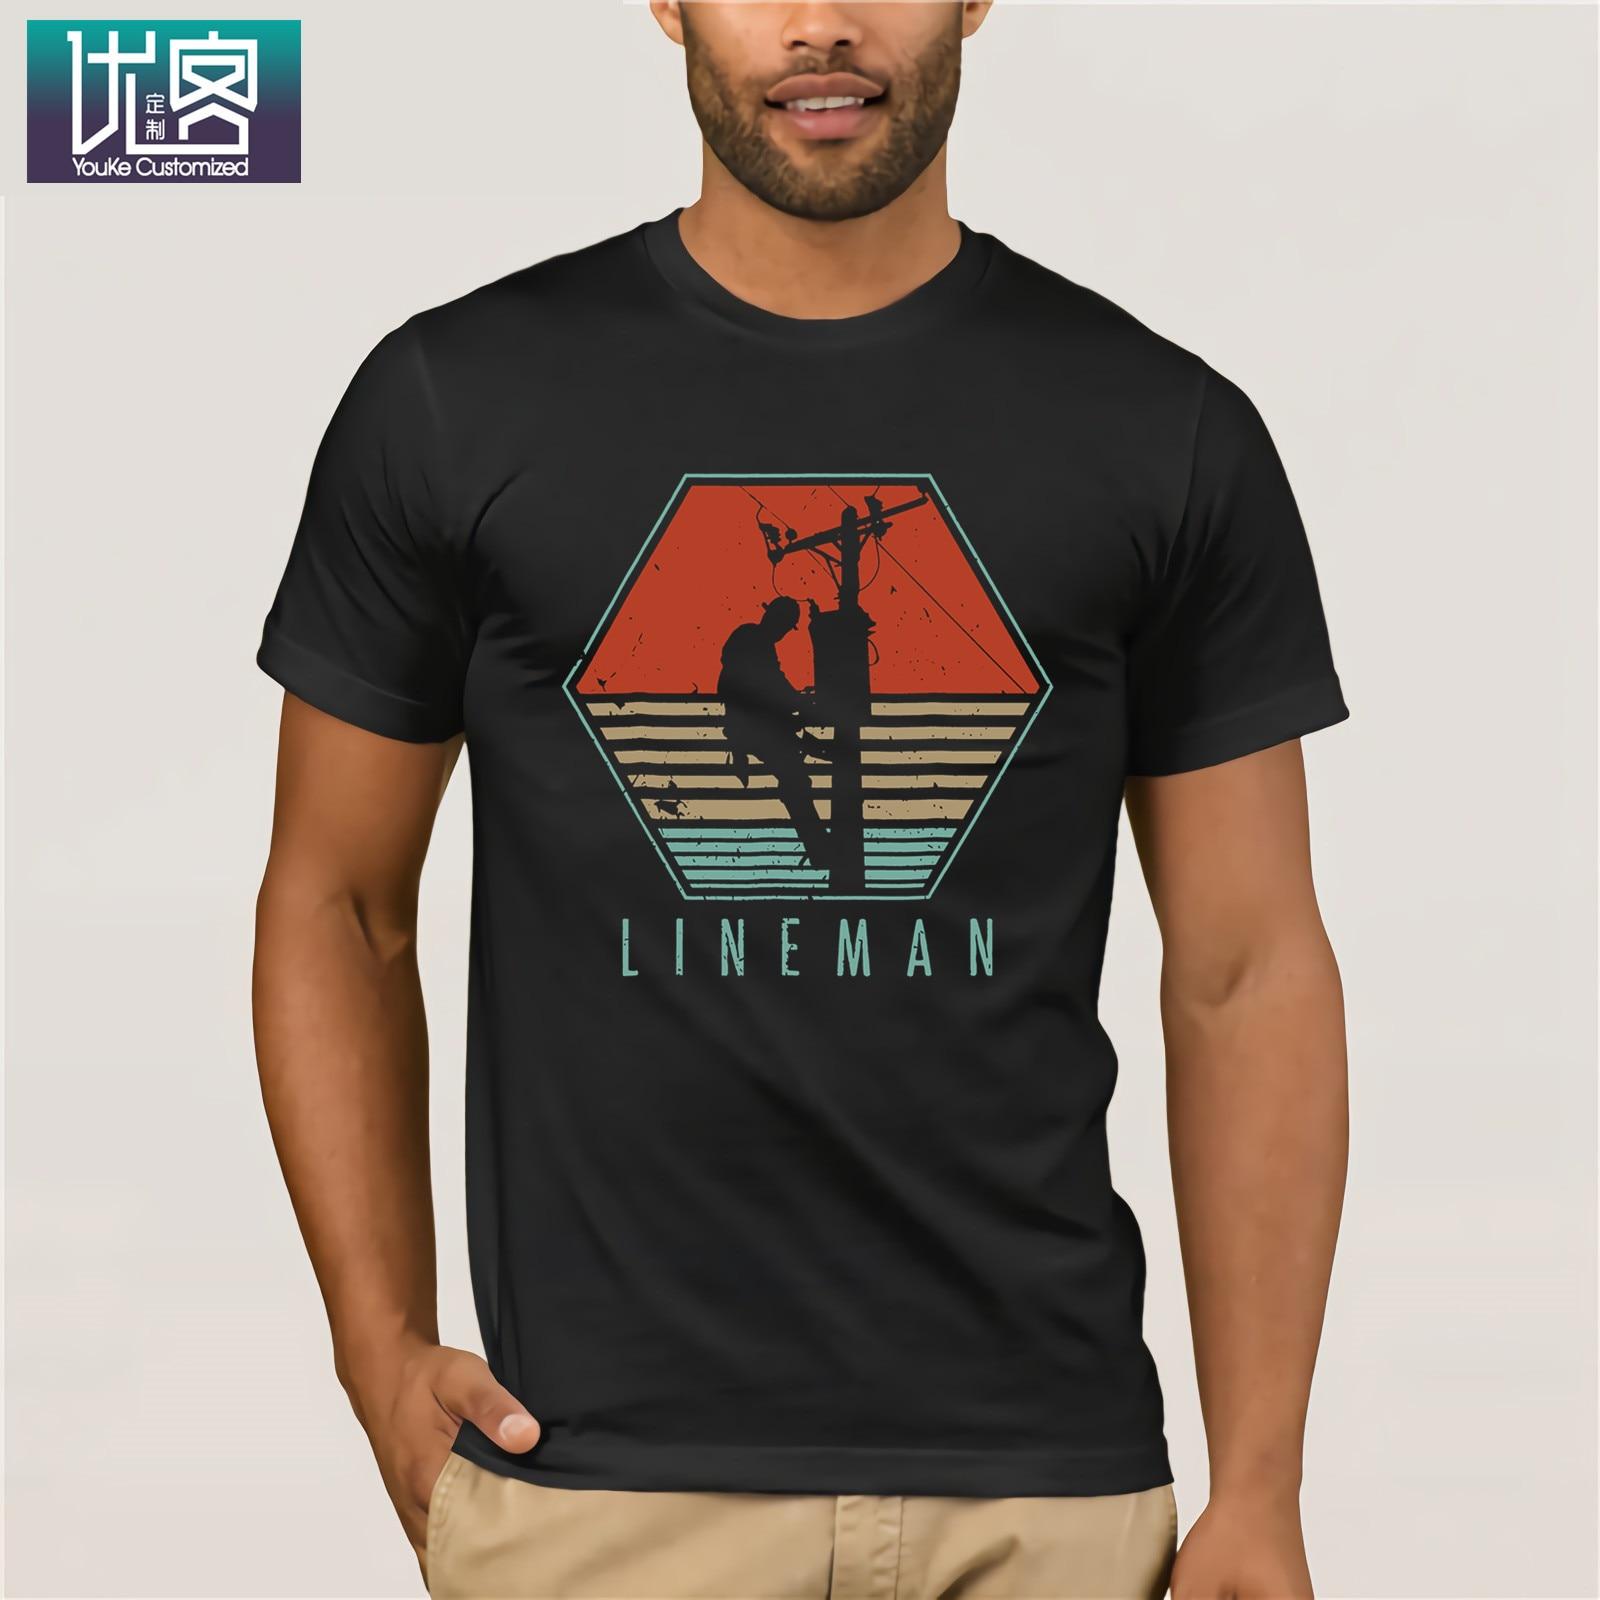 Mens Lineman T Shirt Vintage Retro Electrician Gift Amazing Short Sleeve Unique Casual Tees 100% Cotton Clothes T Shirt